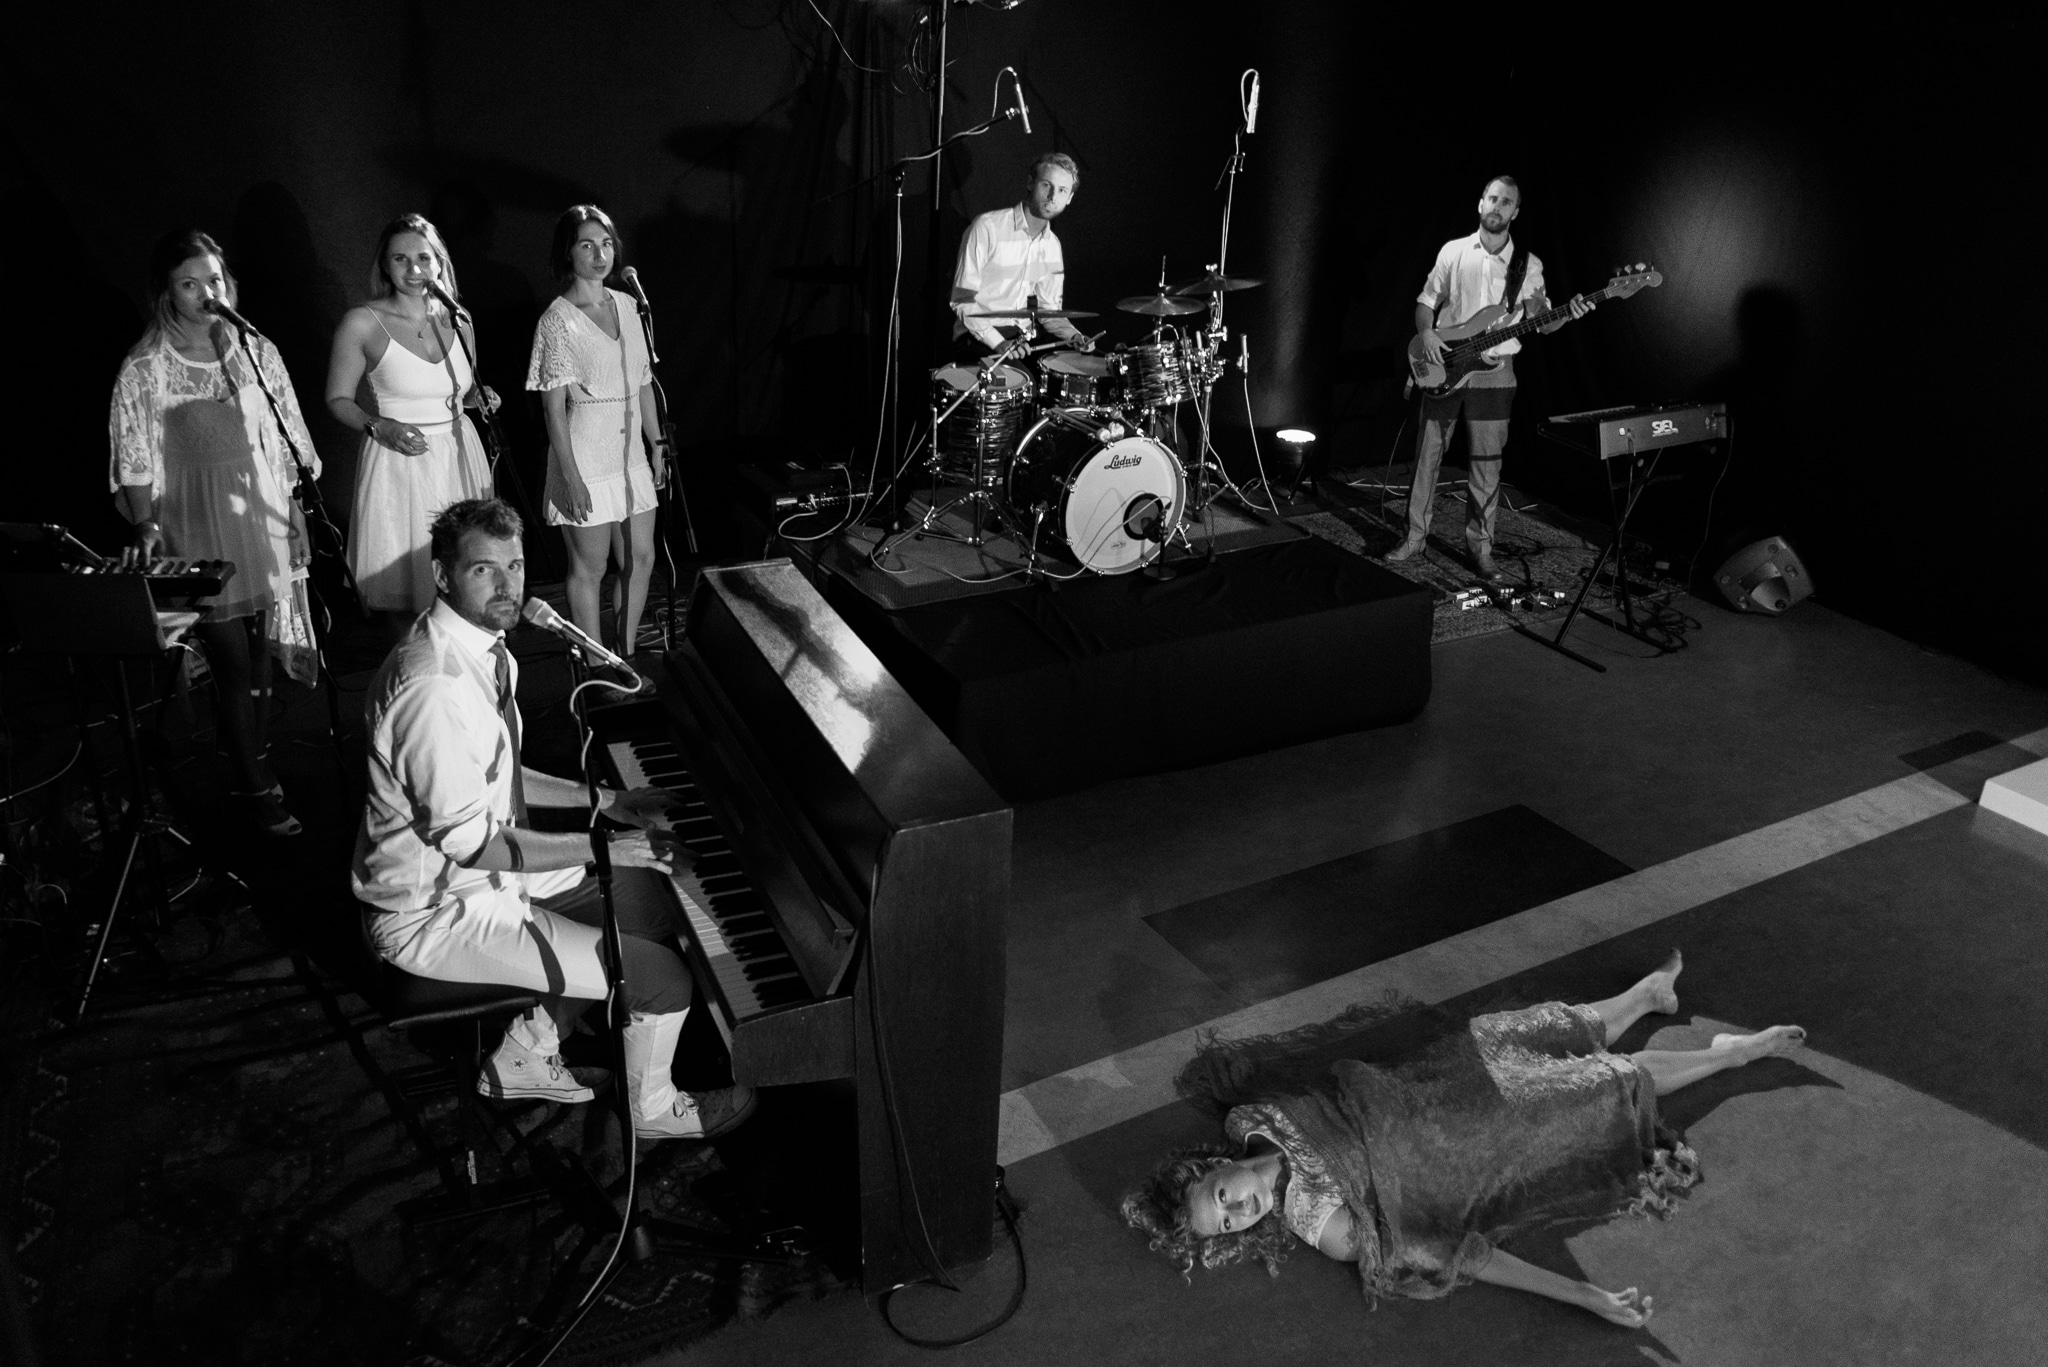 The Stream – Sweet Sally, Sad Departure